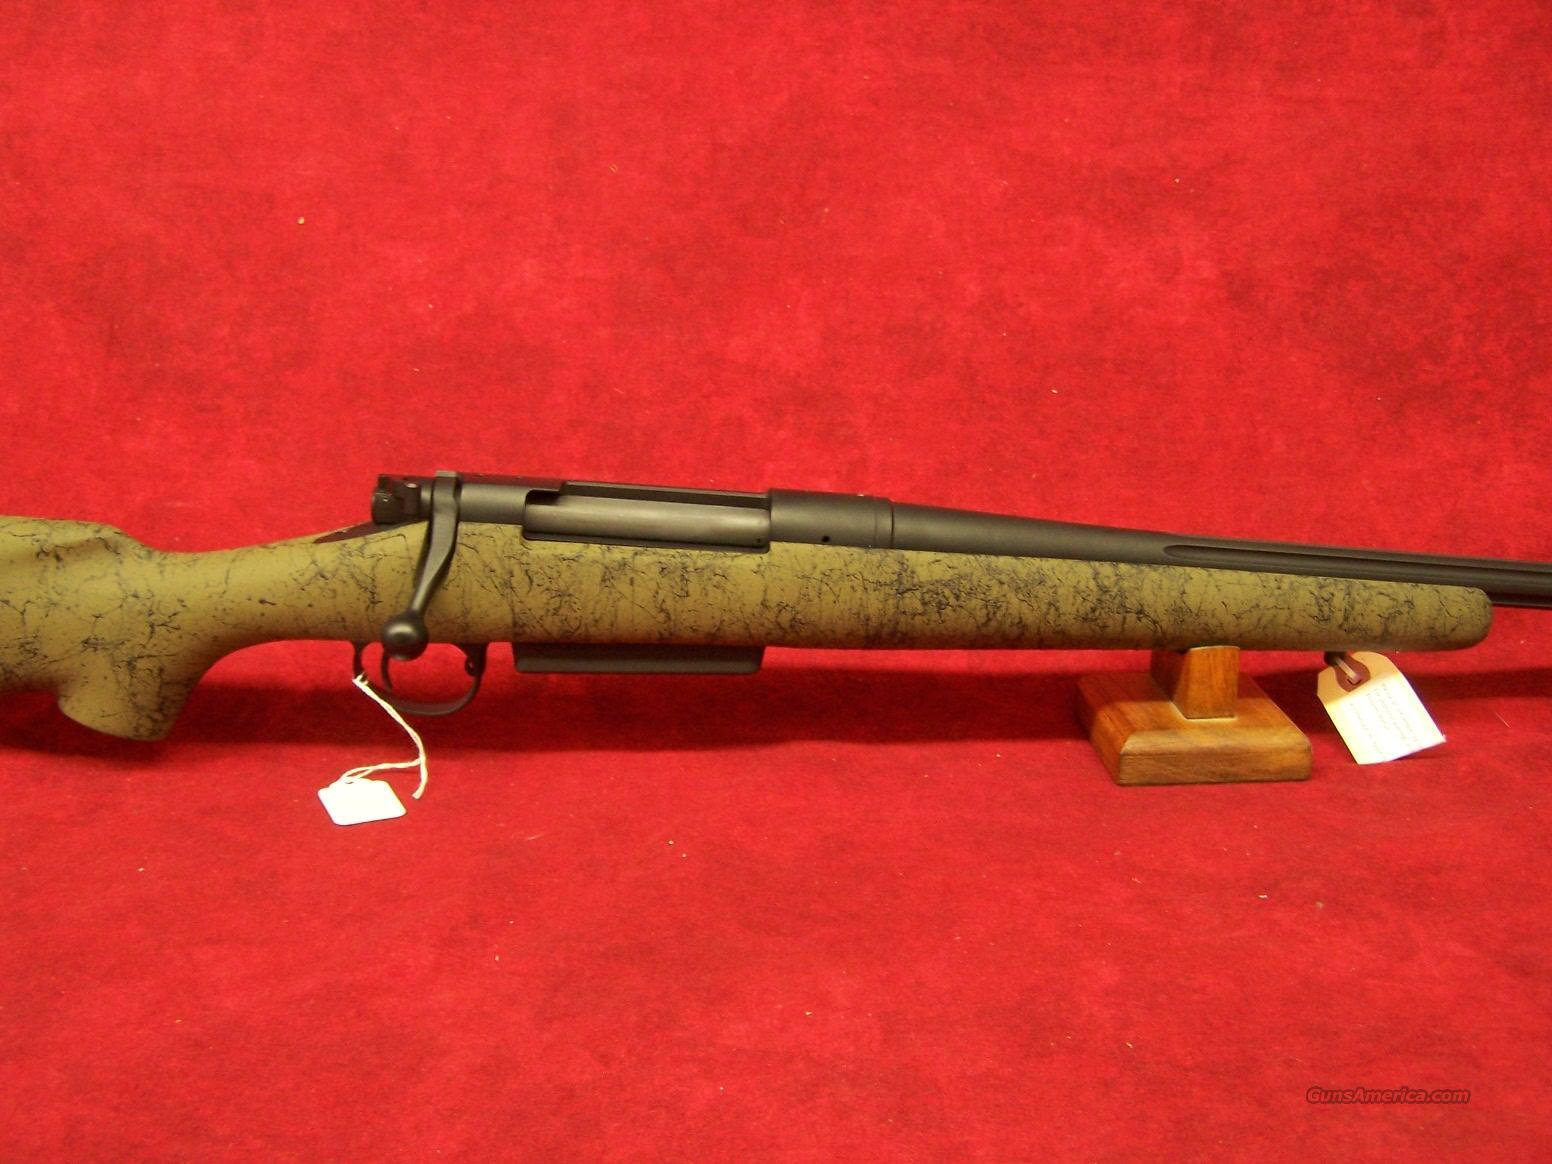 "H-S PRECISION Pro-Series 2000 PHR .338 Lapua 26"" Fluted barrel w/muzzlebreak Olive stock with Black webbing hs precision   Guns > Rifles > HS Precision Rifles"